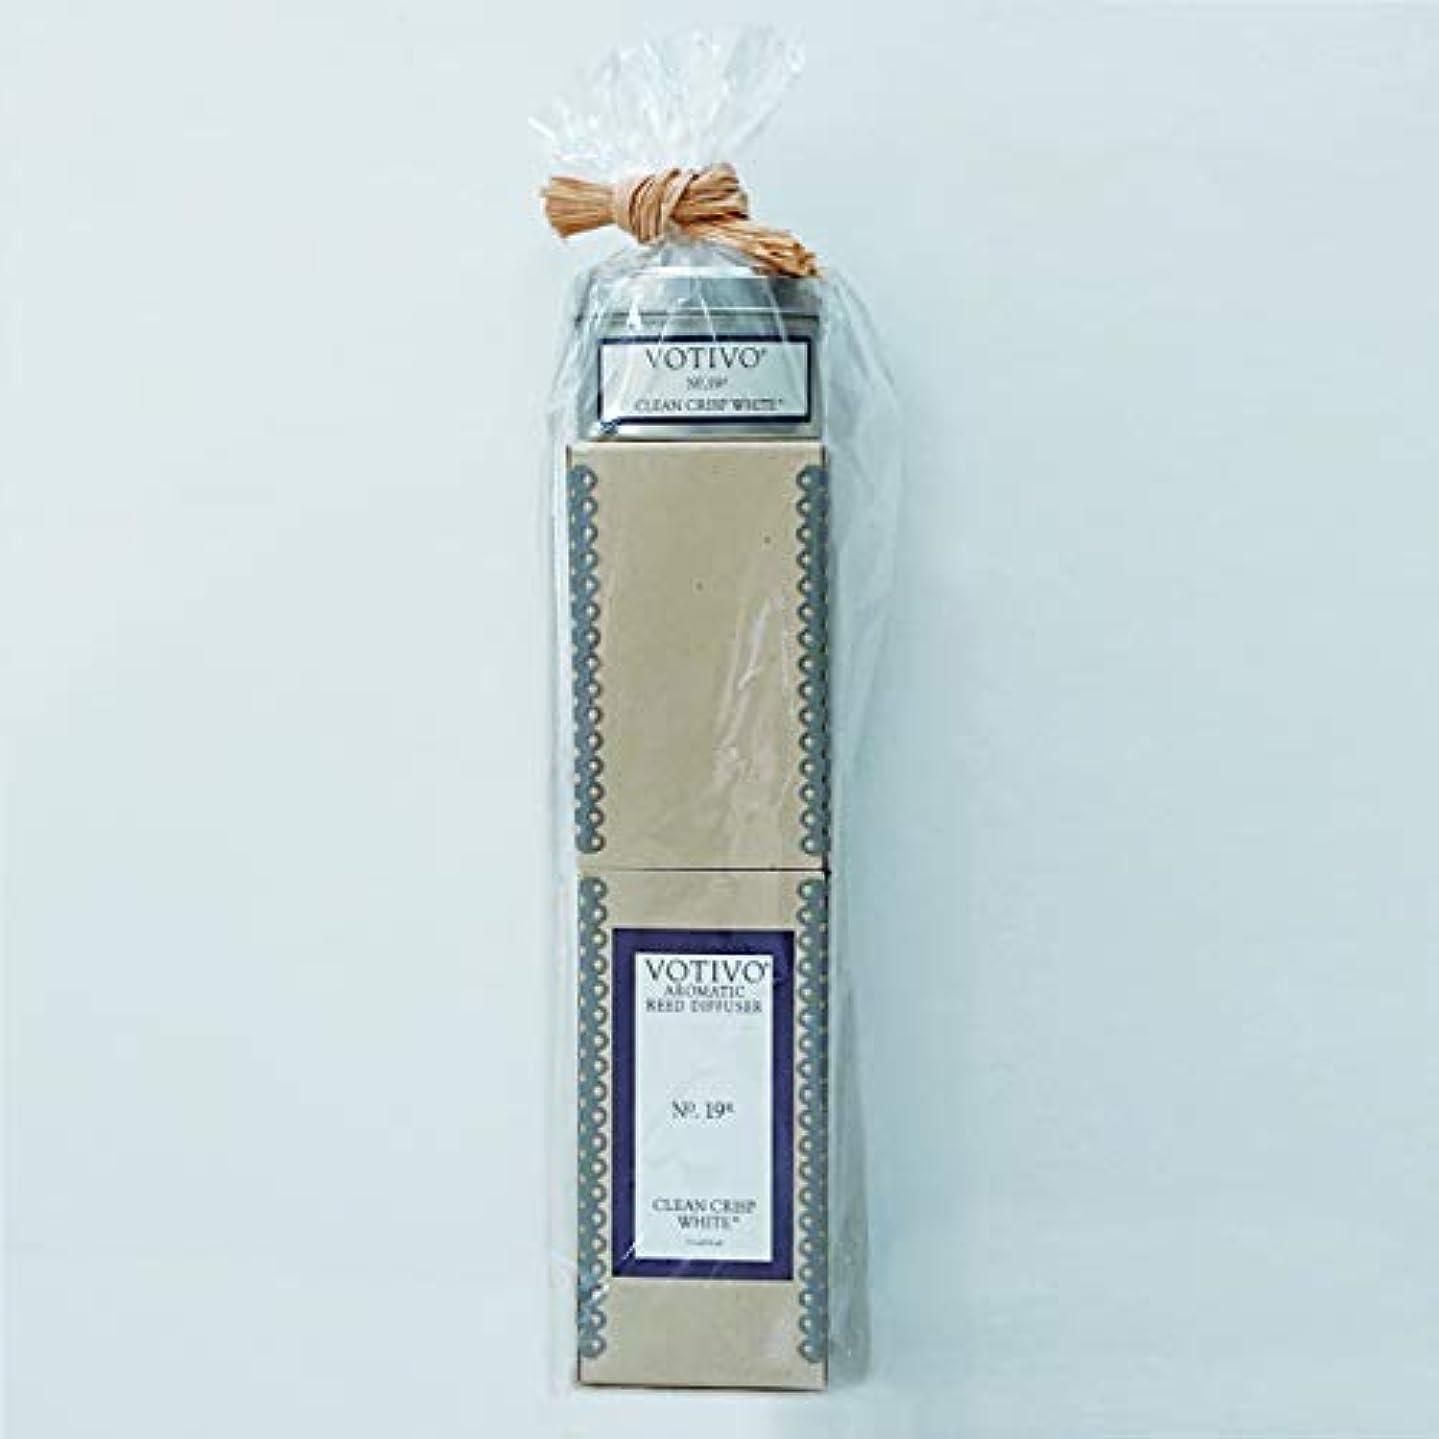 VOTIVO CLEAN CRISP WHITE SPECIAL リードディフューザー, トラベルティンキャンドルセット